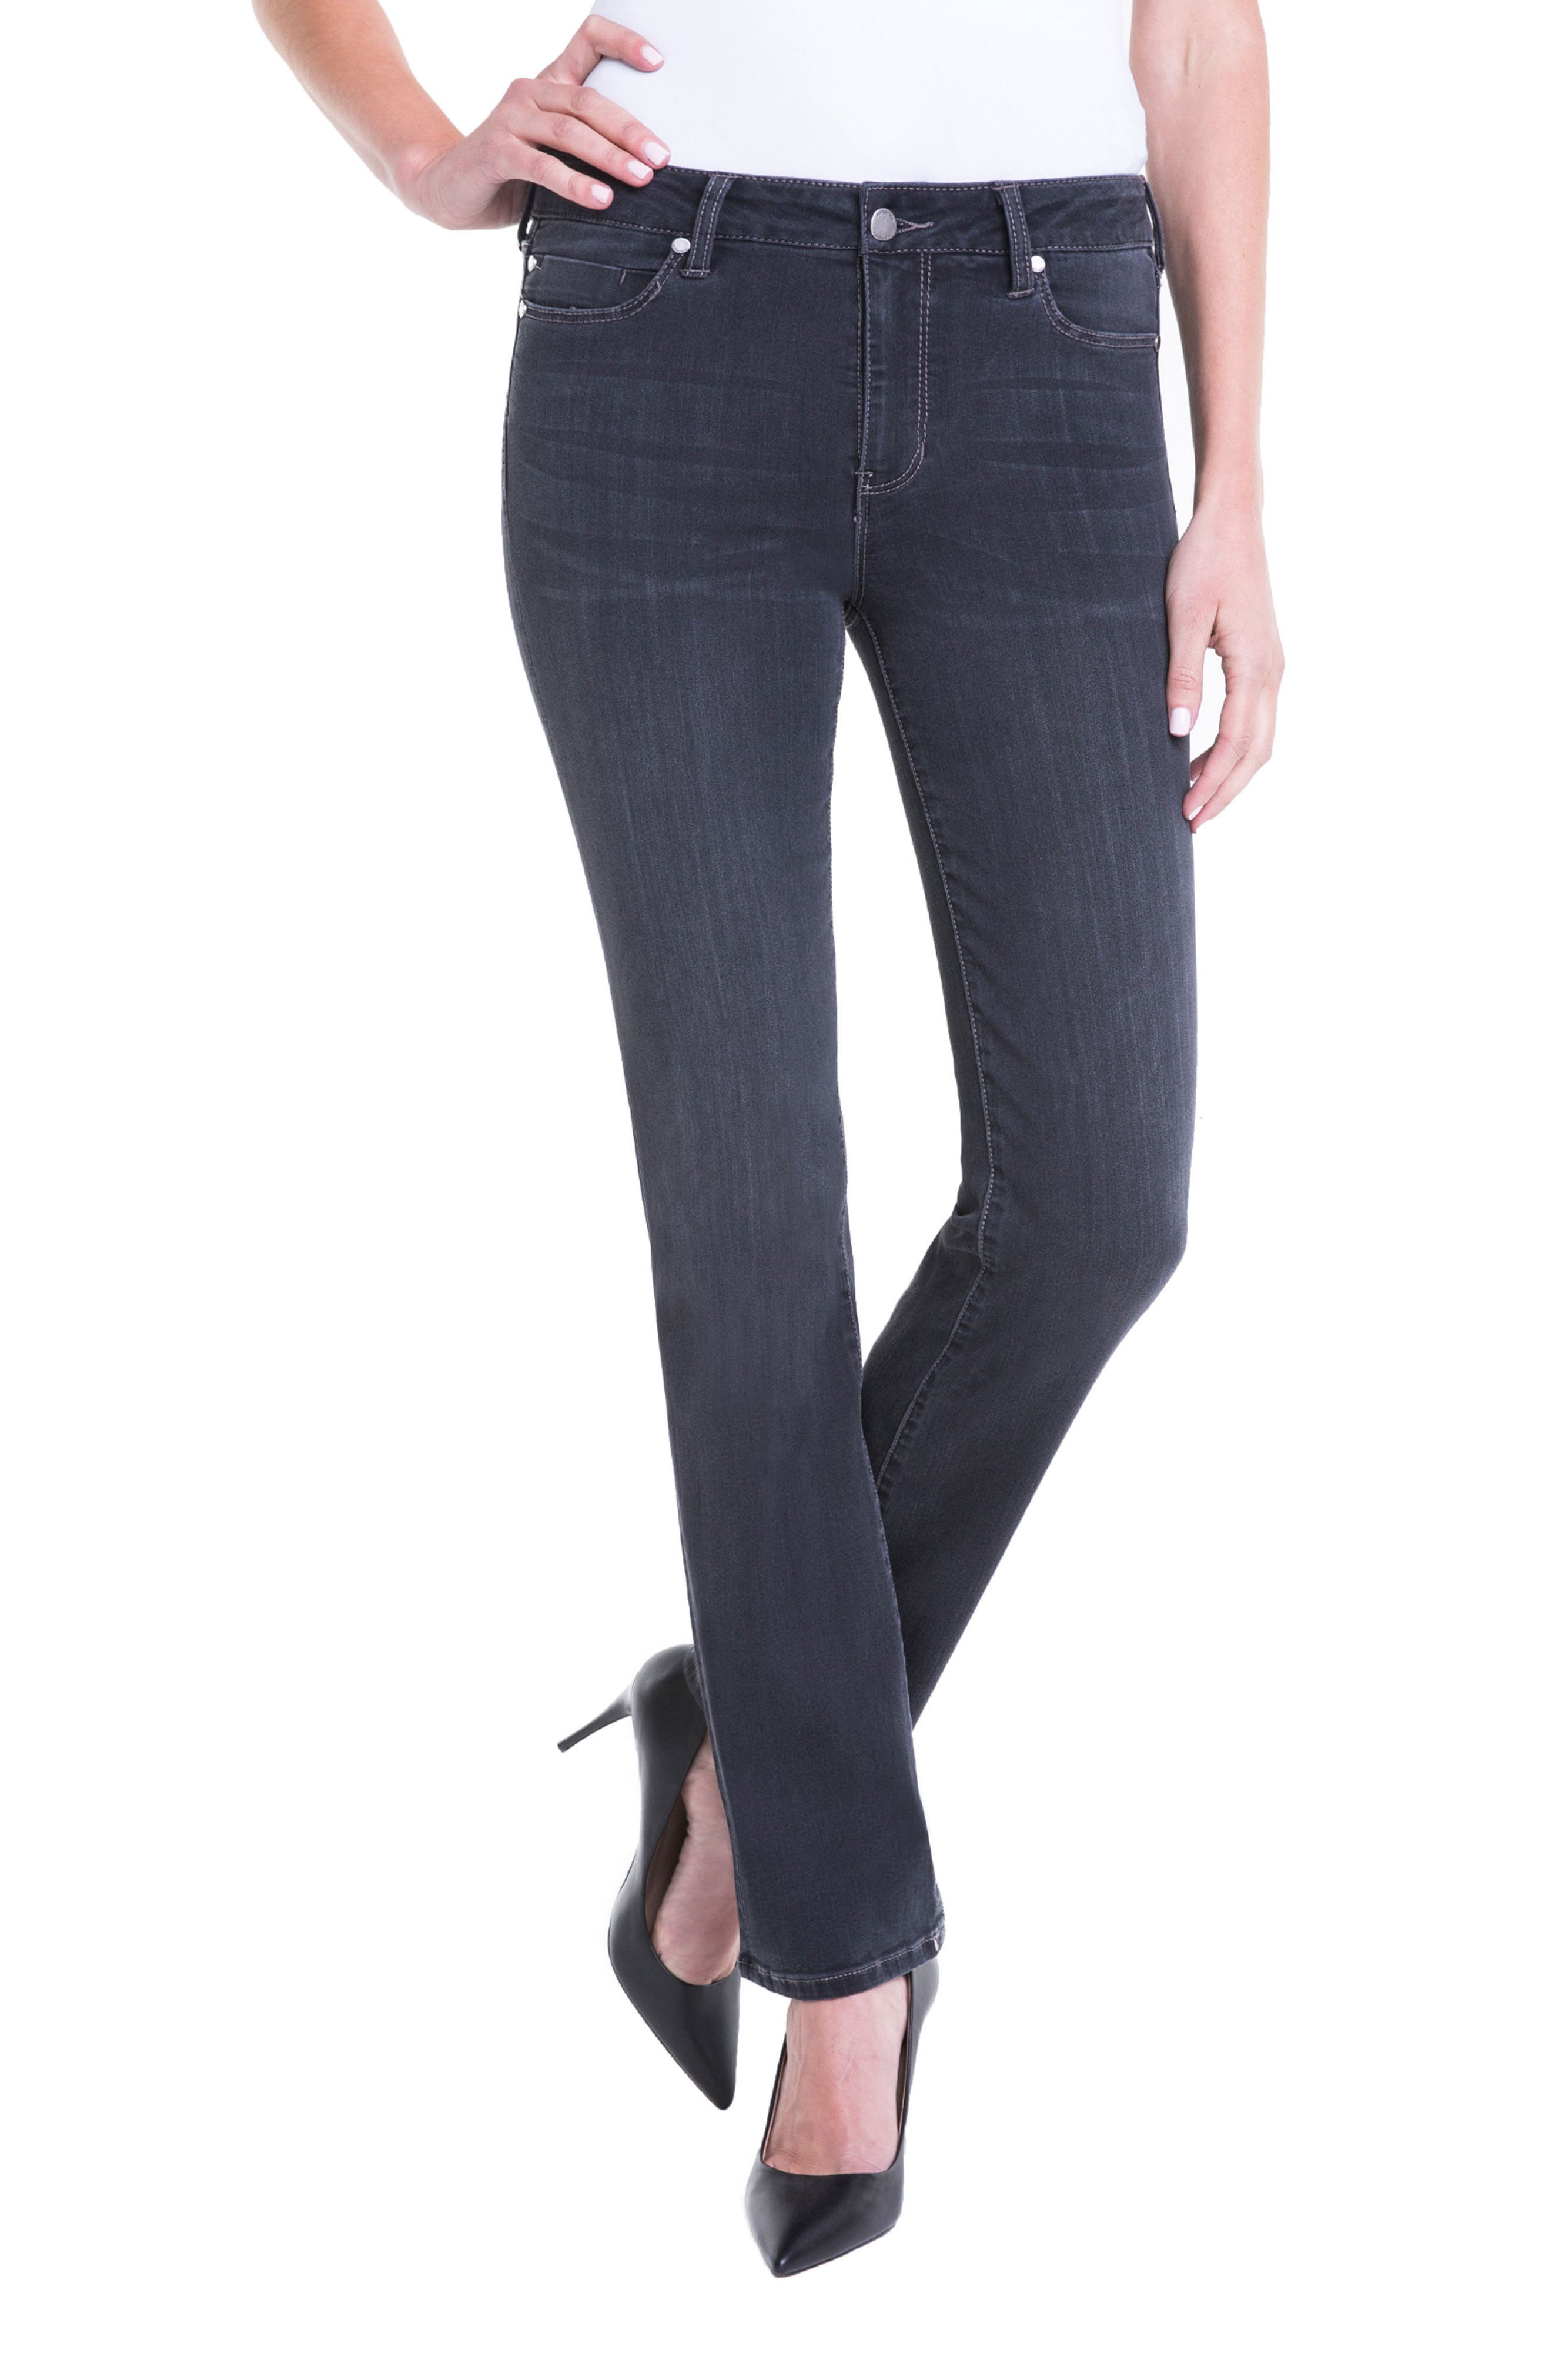 Liverpool Jeans Company Sadie Straight Jeans (Meteorite)